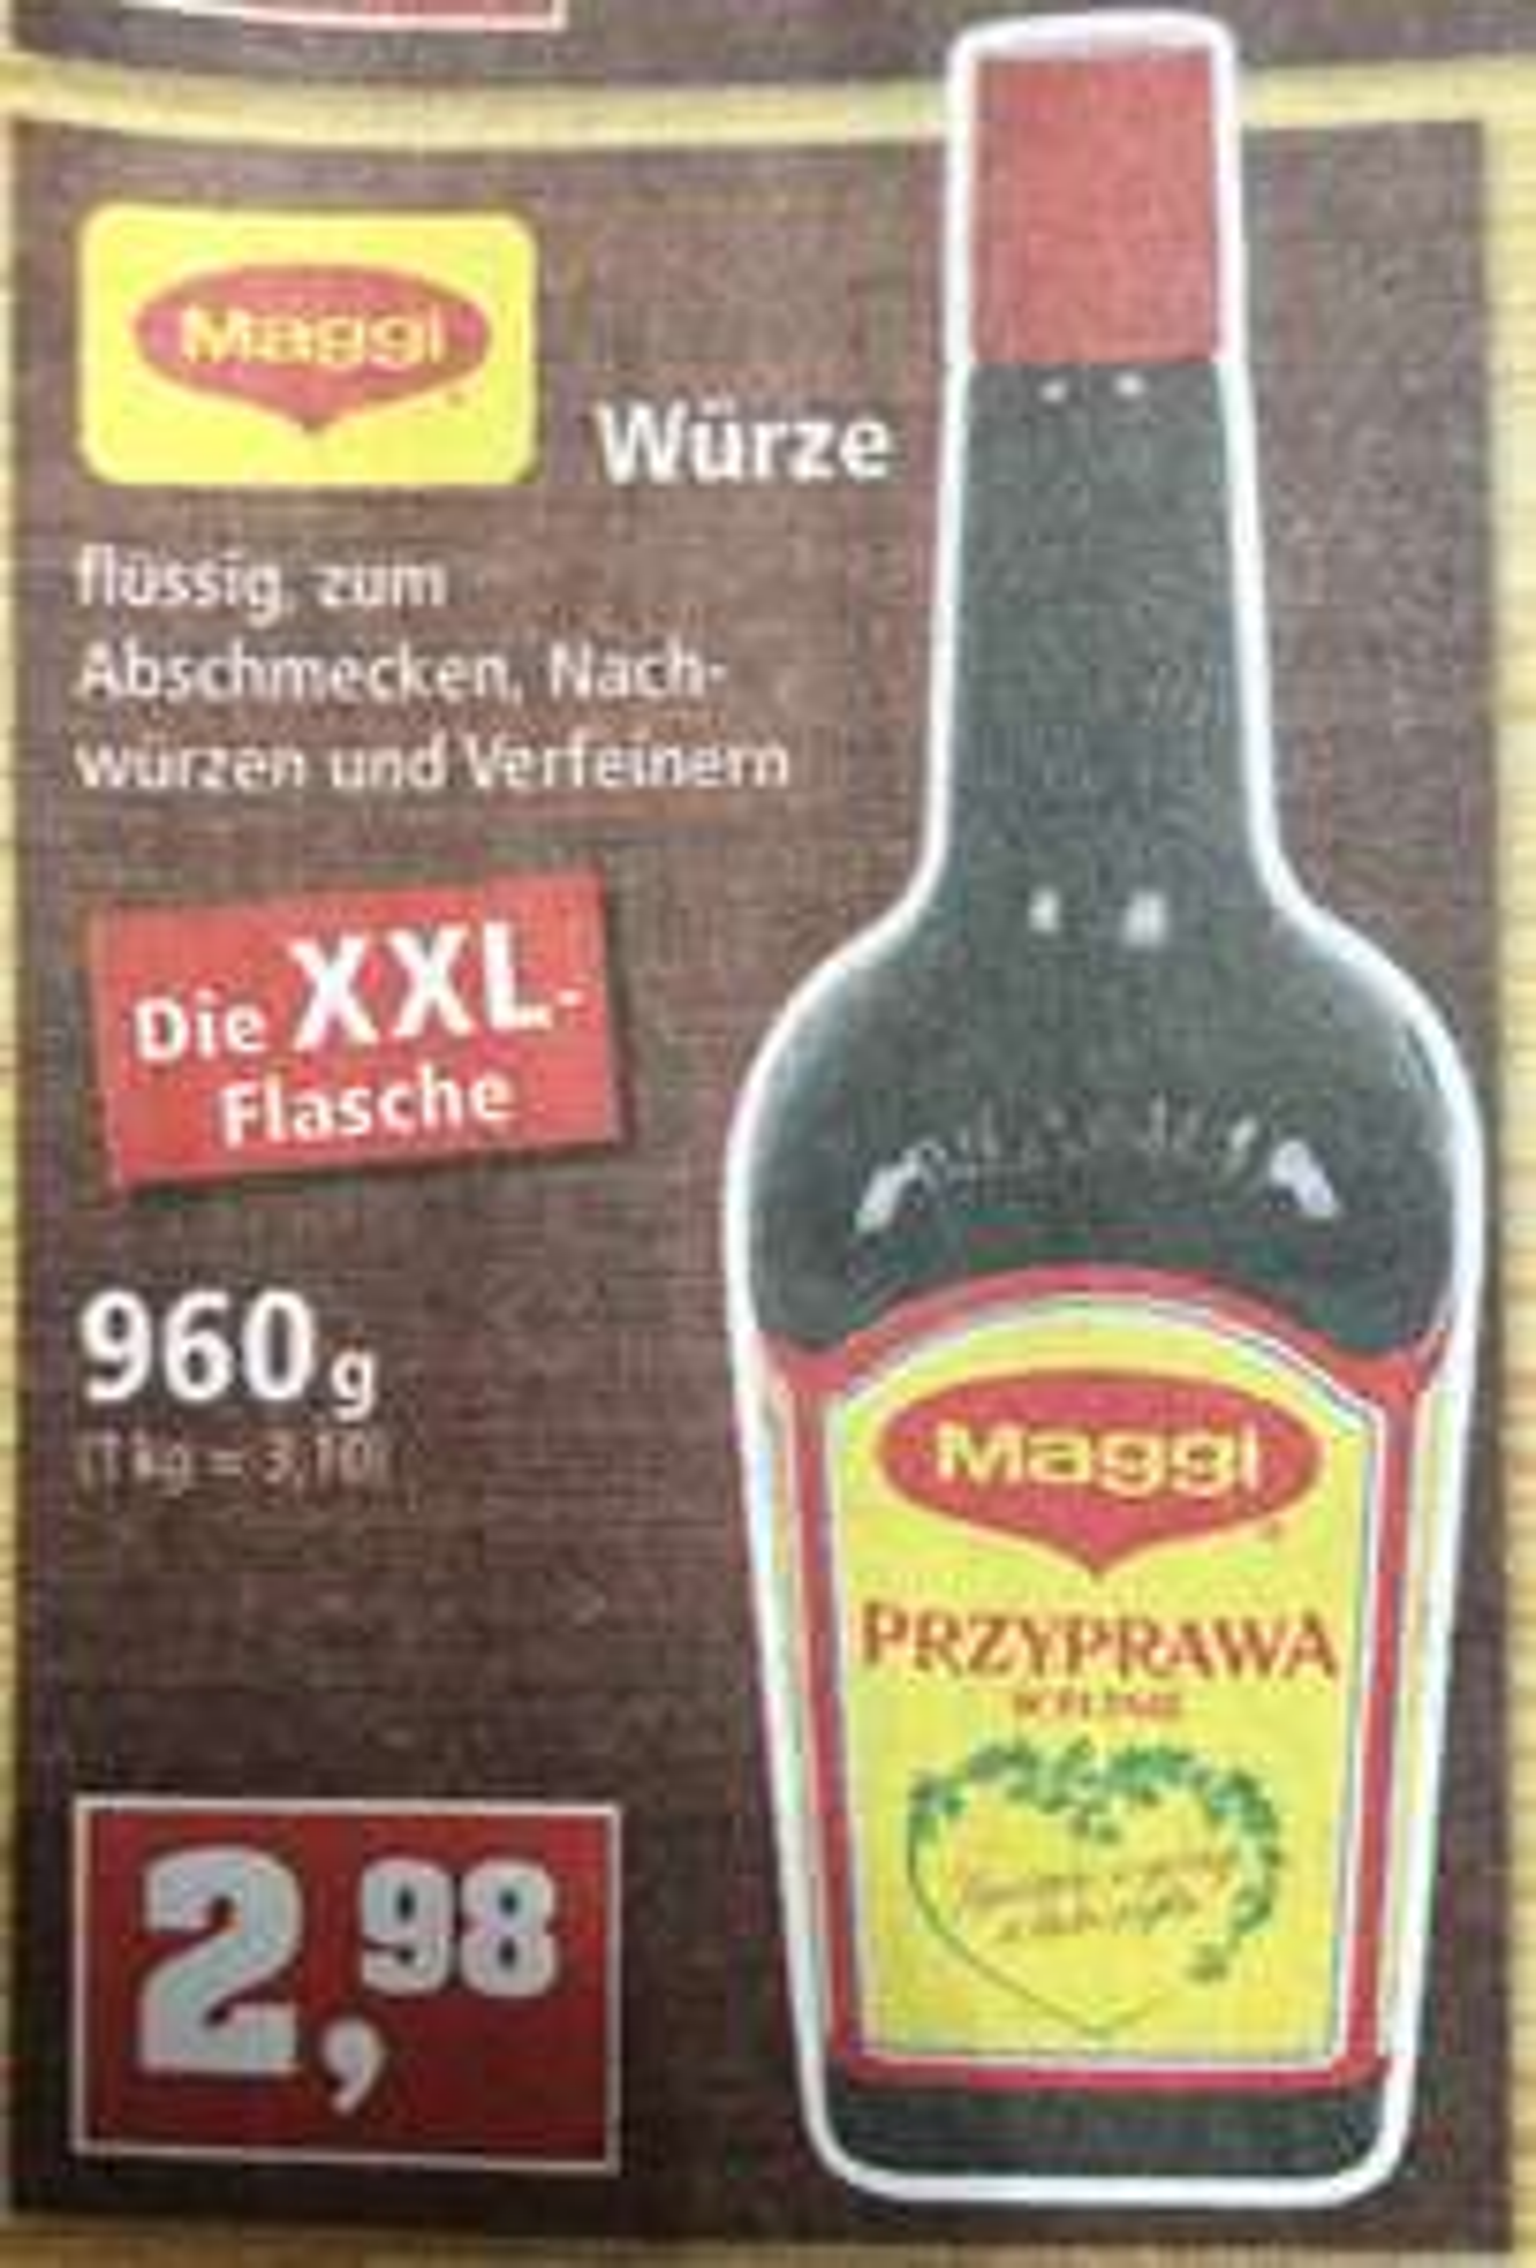 Thomas Philipps Maggi Würze XXL 960ml 2,98 [polnische Sorte]